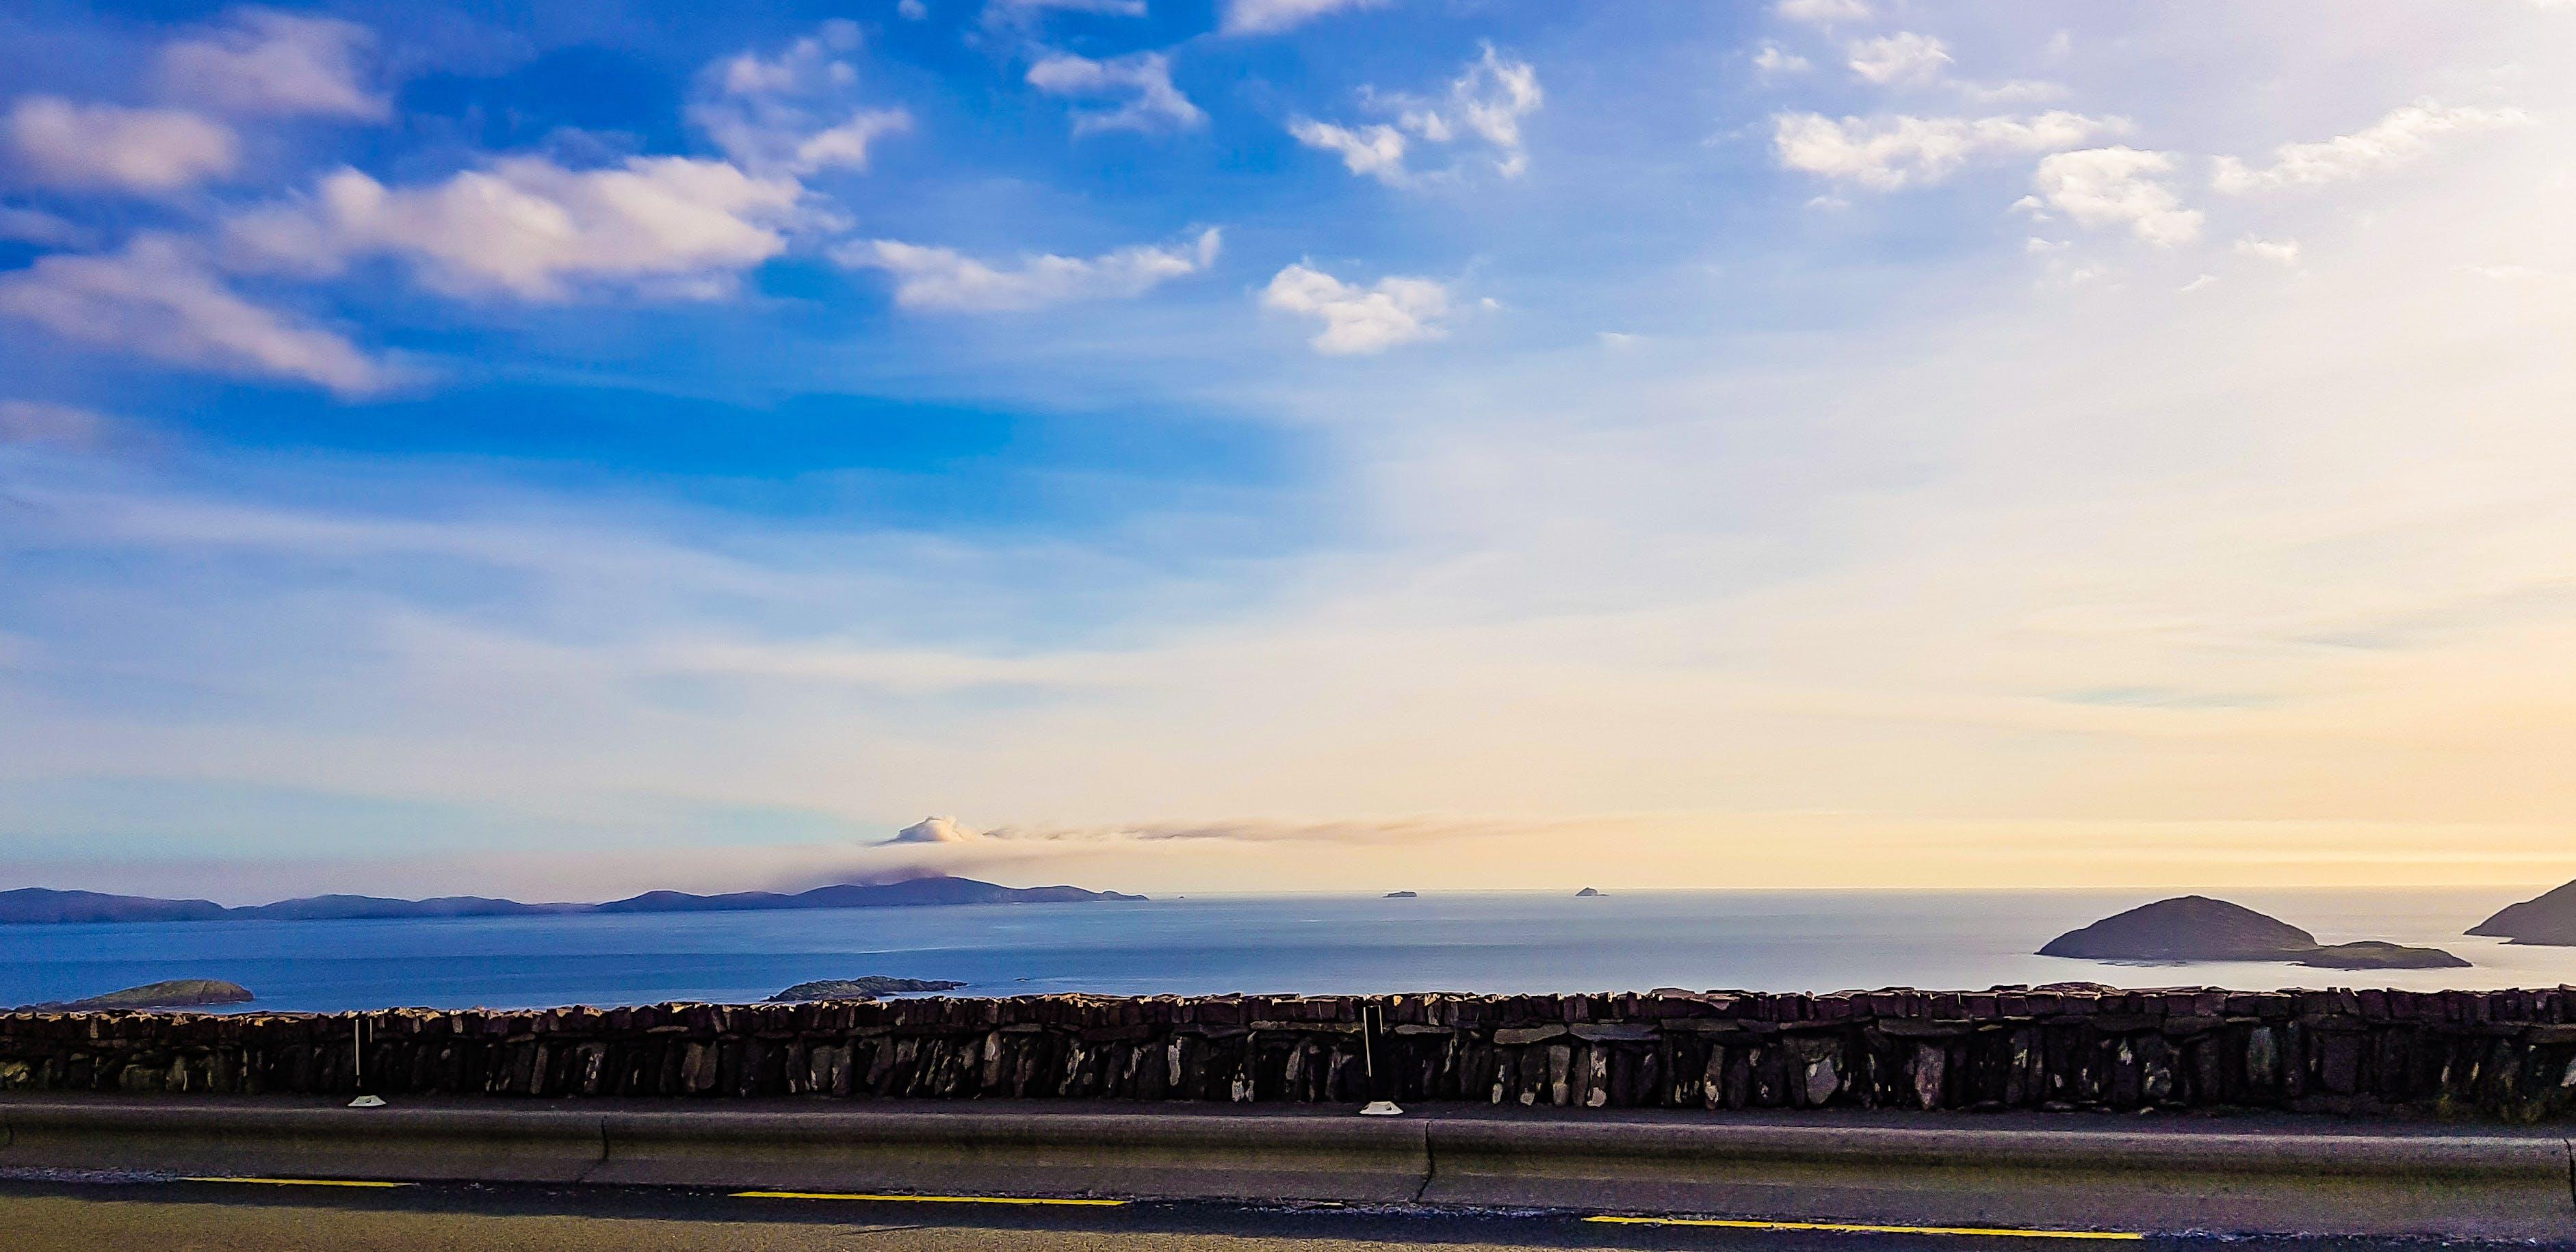 Free stock photo of atlantic ocean, beach, Blue ocean, blue sky